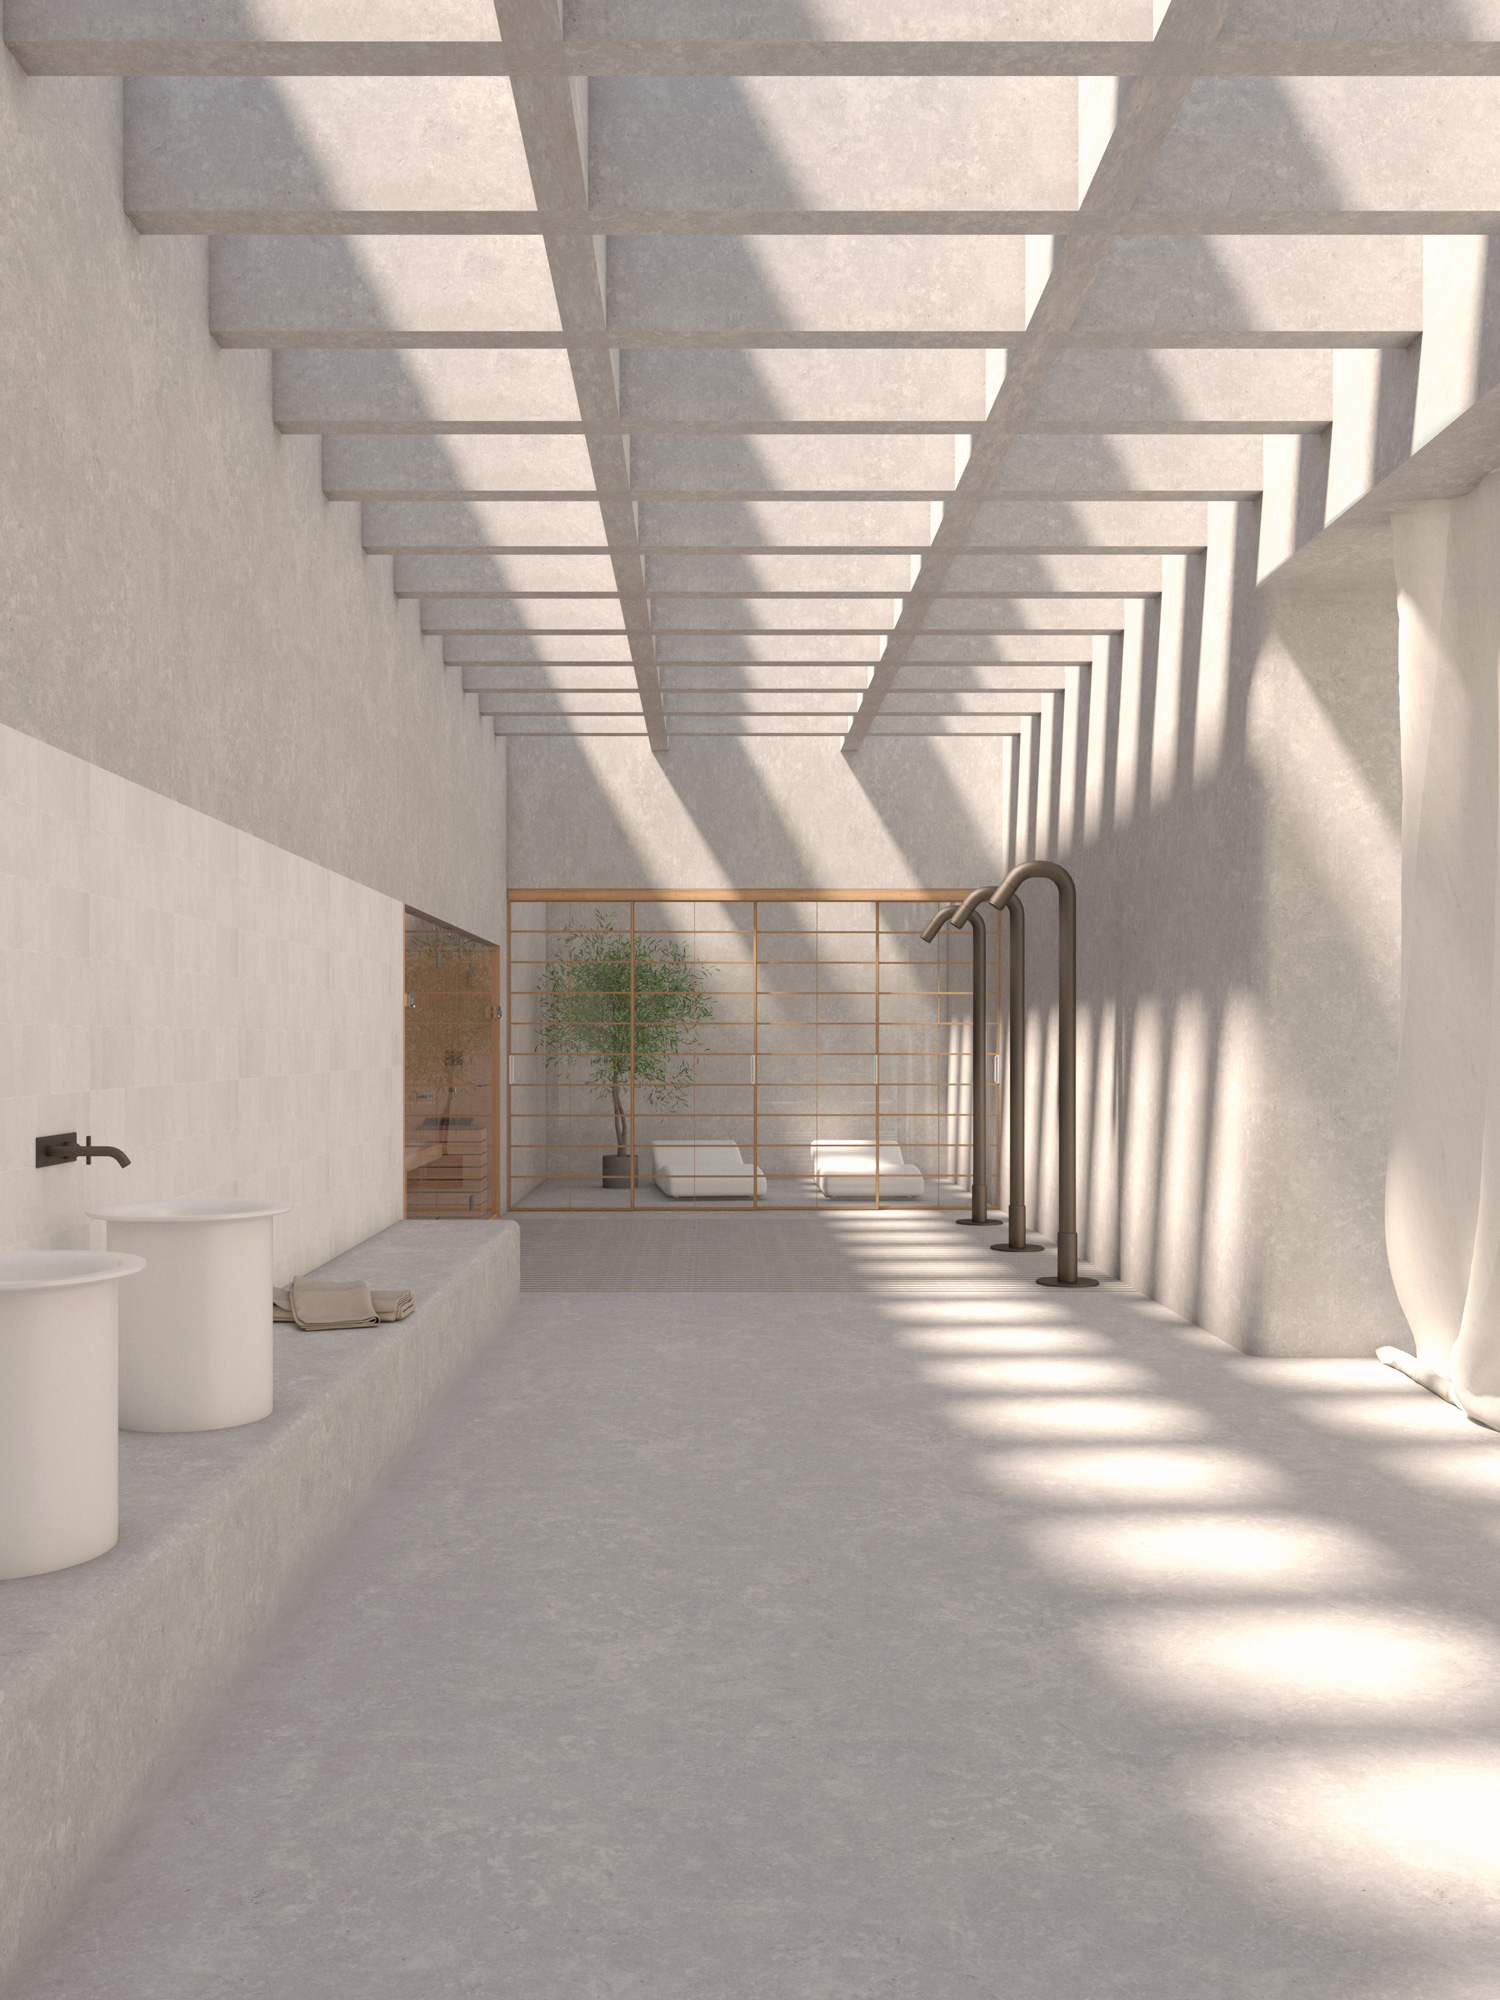 04_bagno_mediterraneo_agape_lavabo_doccia_tubes_fantini_gandiablasco_rimadesio_soho_stucco_atelierszeliji_effegibi_sauna_bagnoturco_homespa_spaziomateriae_interiordesign_napoli_photo.jpg